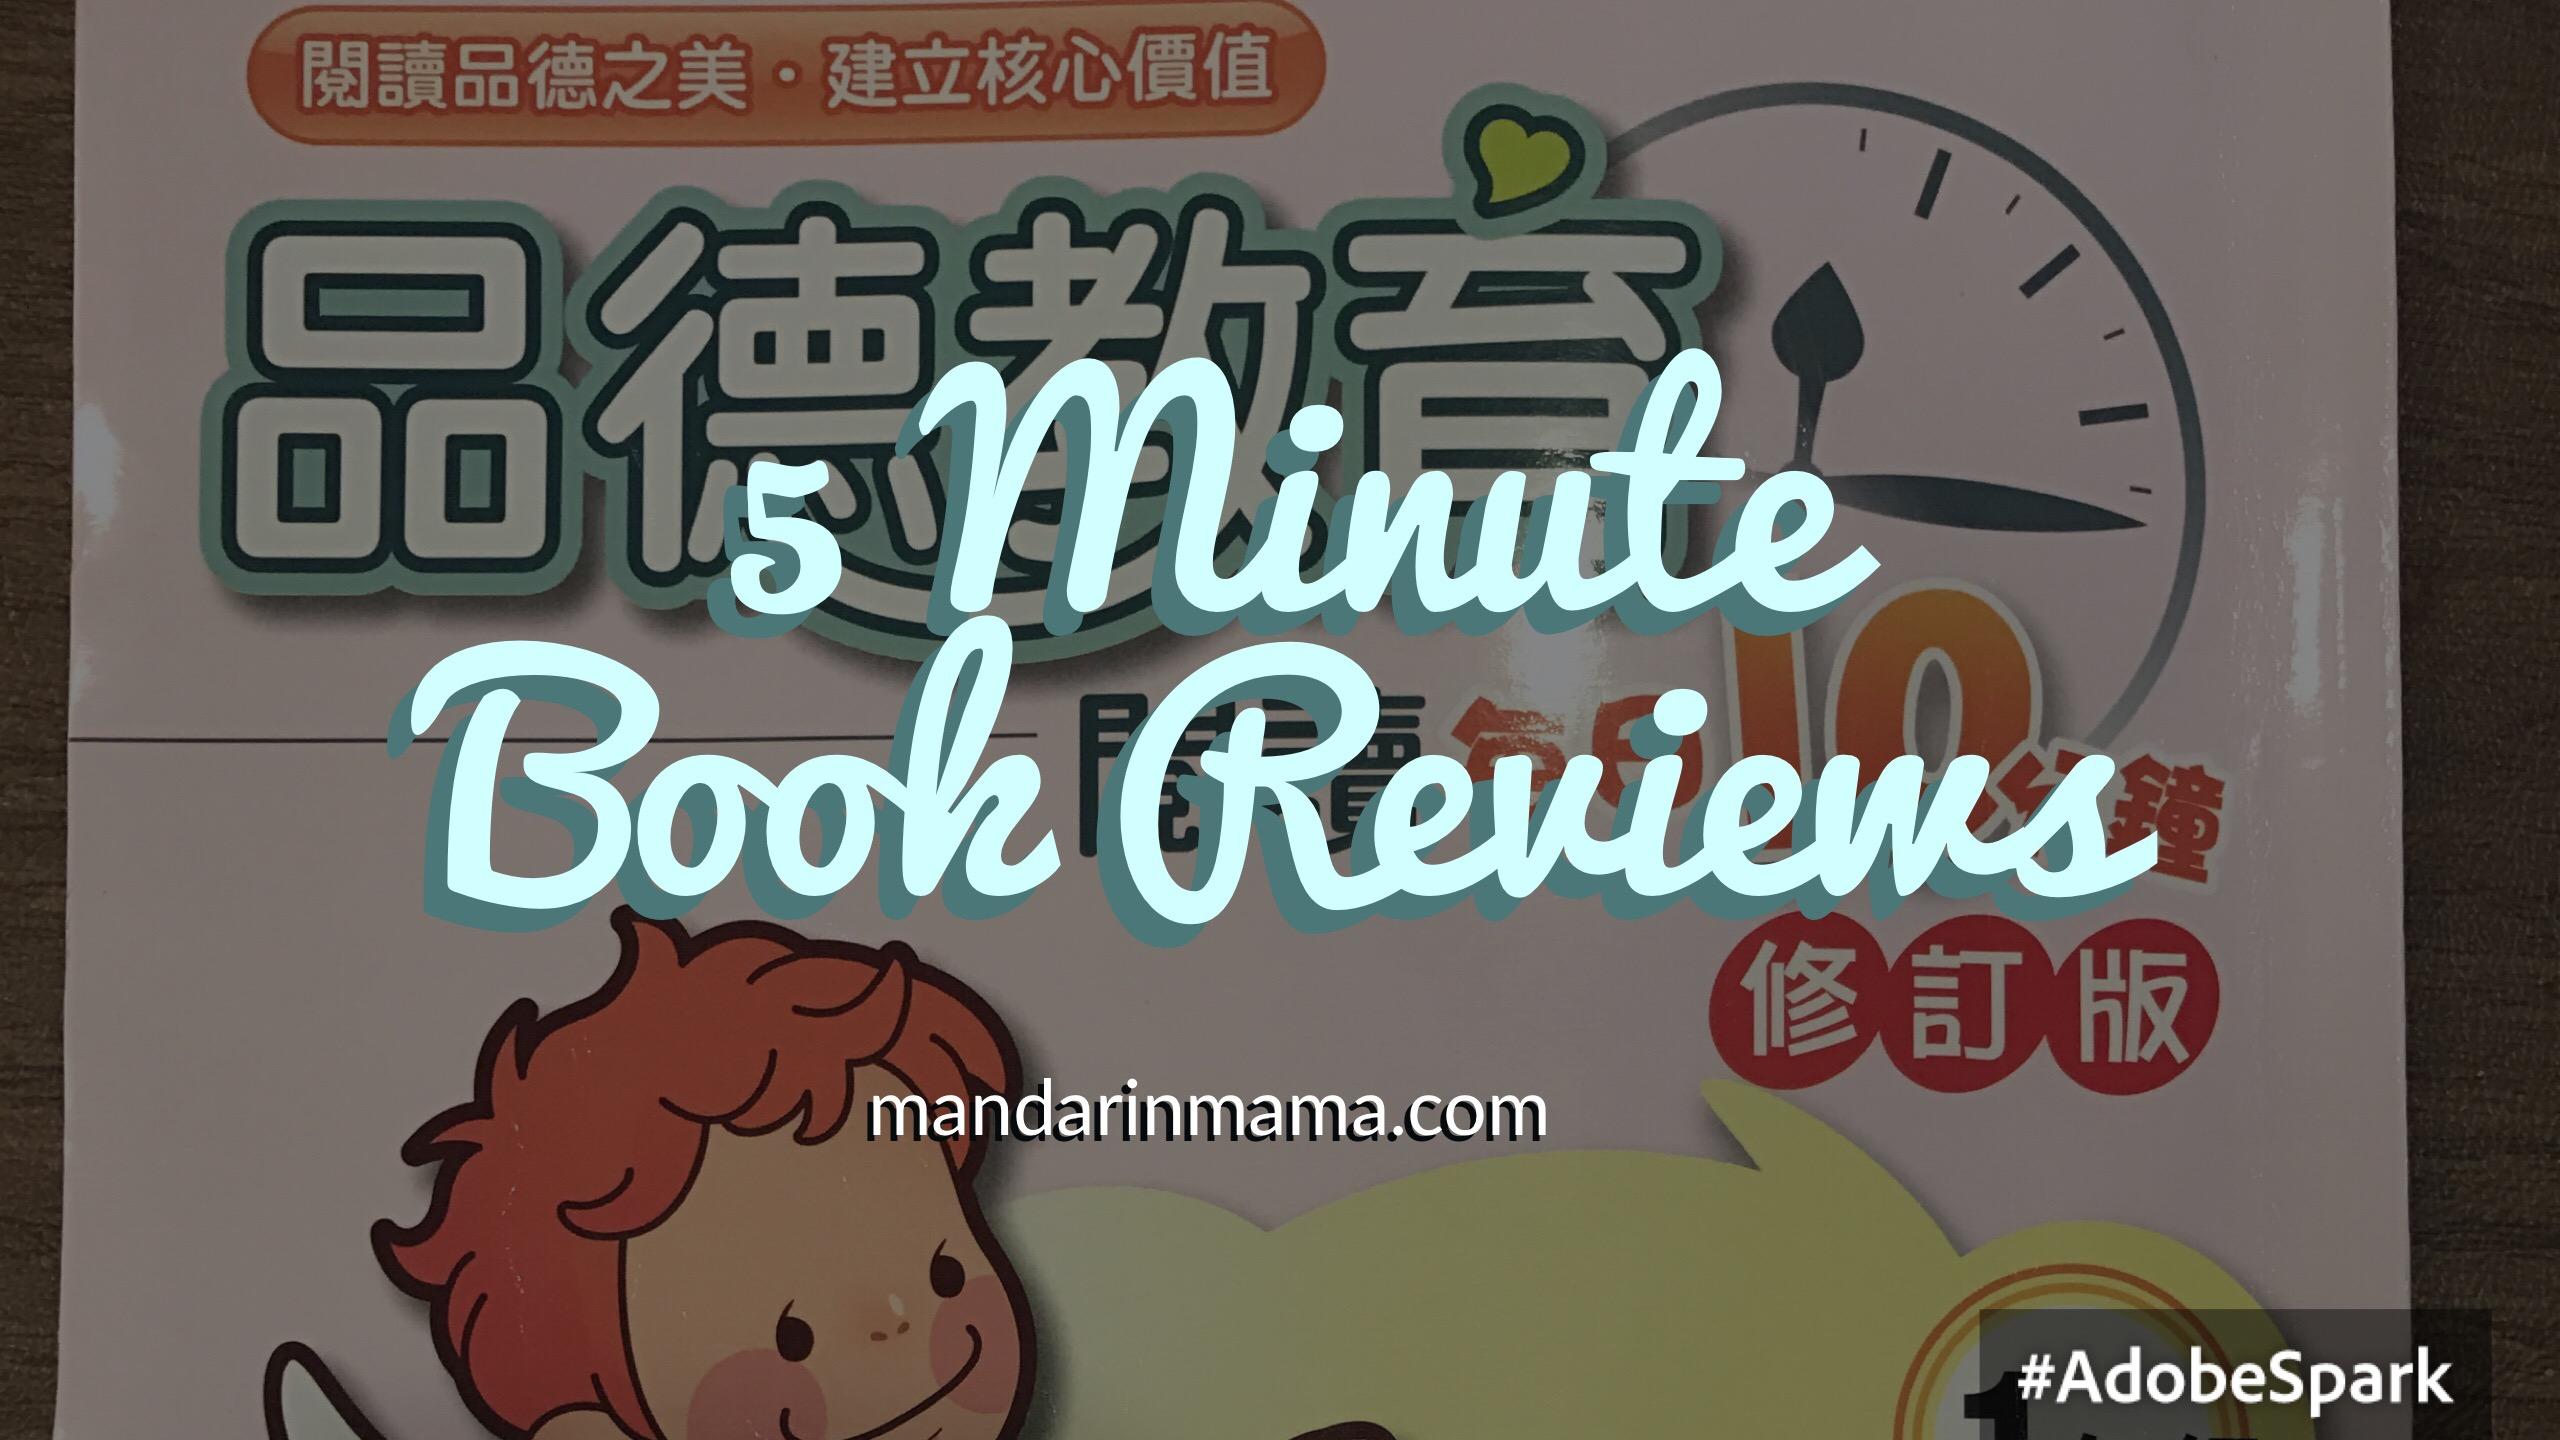 品德教育閱讀每日10分鍾: Book Review